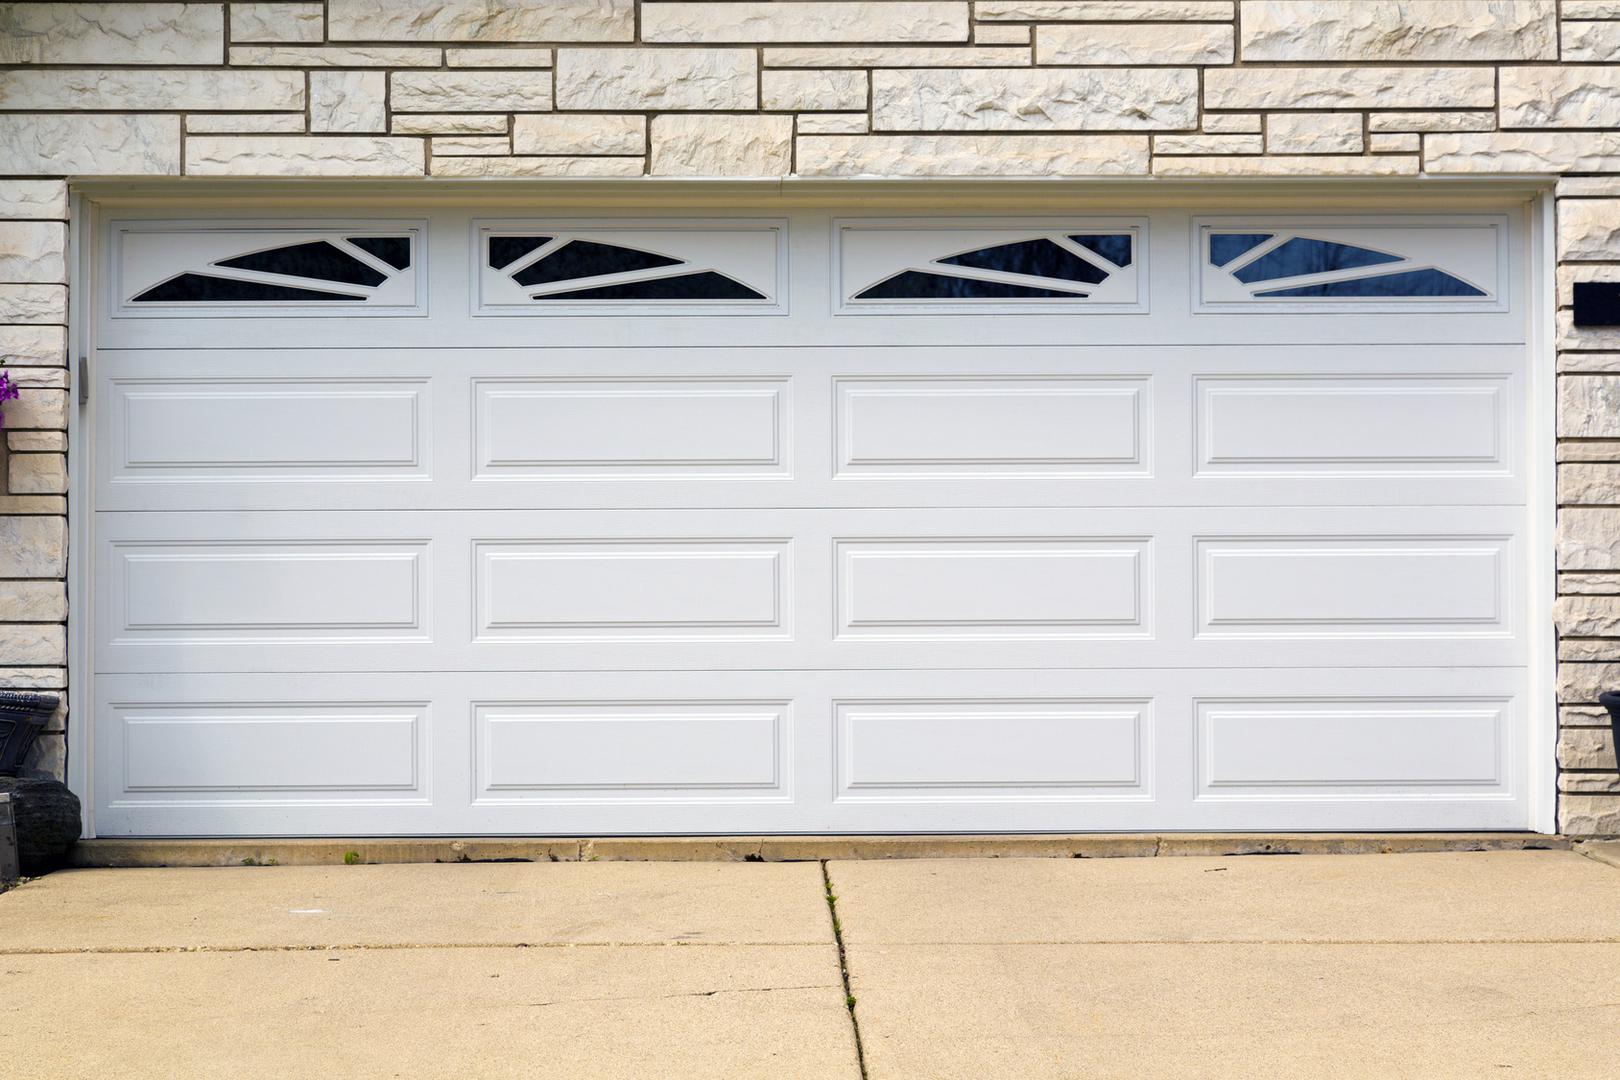 Samson Garage Doors 4372 Murray ave, Pittsburgh, PA 15217 - YP.com